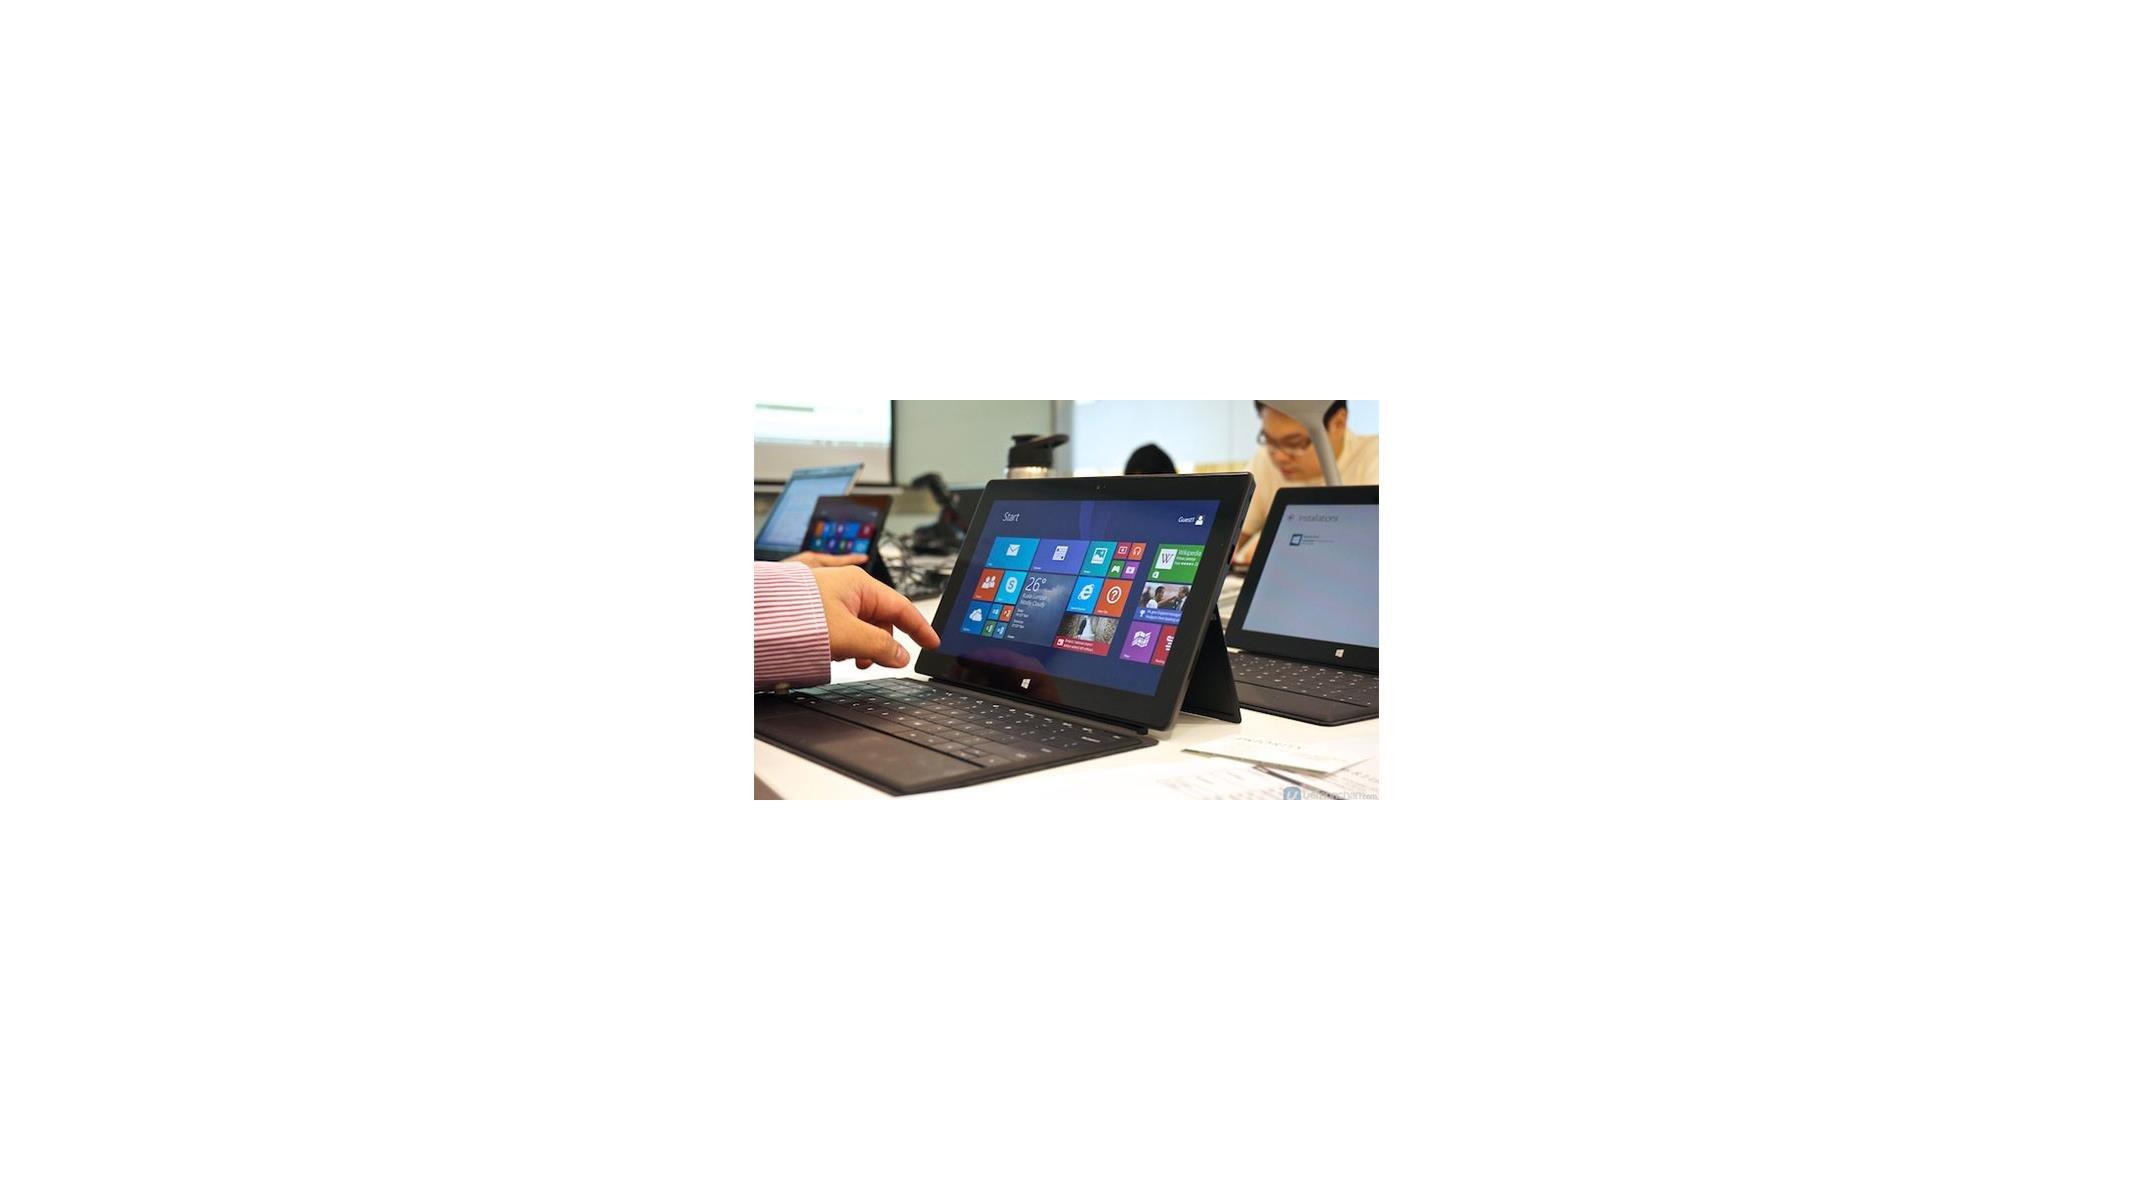 Microsoft Windows 10 AutoPilot To Delight IT Admins With